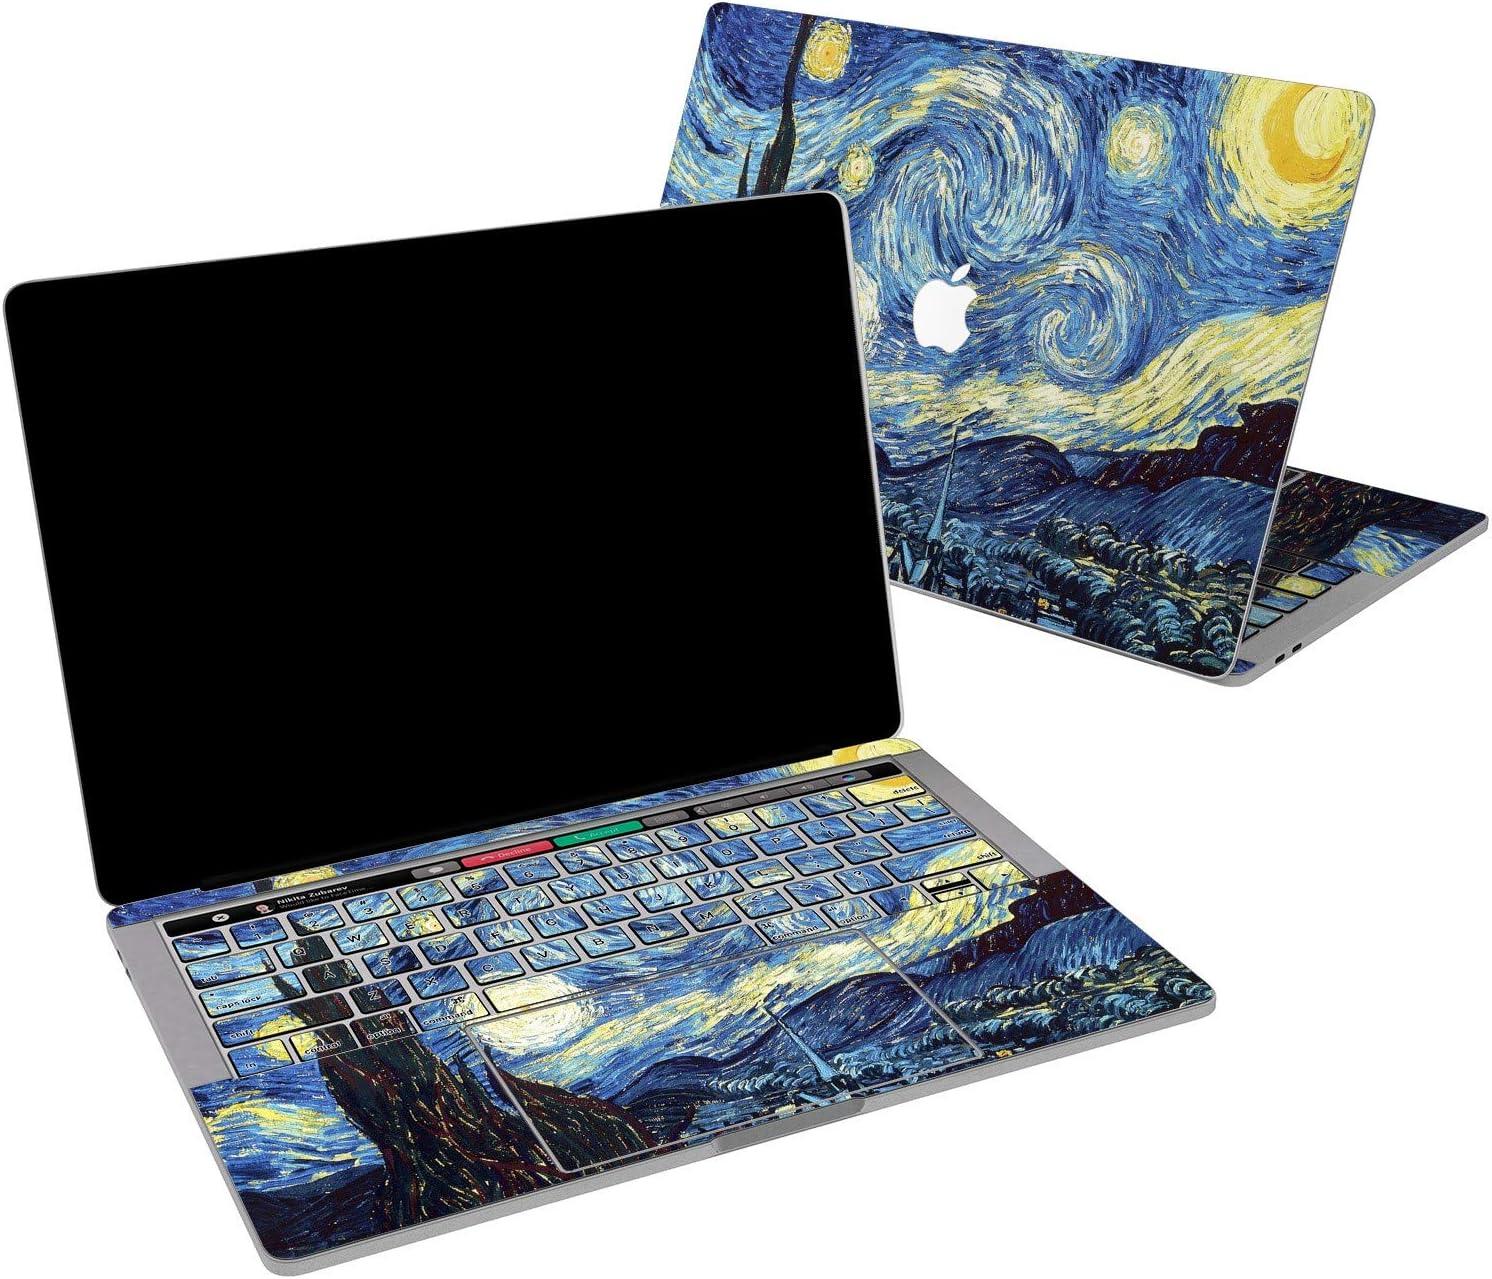 Lex Altern Vinyl Skin for MacBook Air 13 inch Mac Pro 16 15 Retina 12 11 2020 2019 2018 2017 Starry Night Van Gogh Artwork Blue Yellow Painting Laptop Cover Keyboard Decal Sticker Touch Bar Women